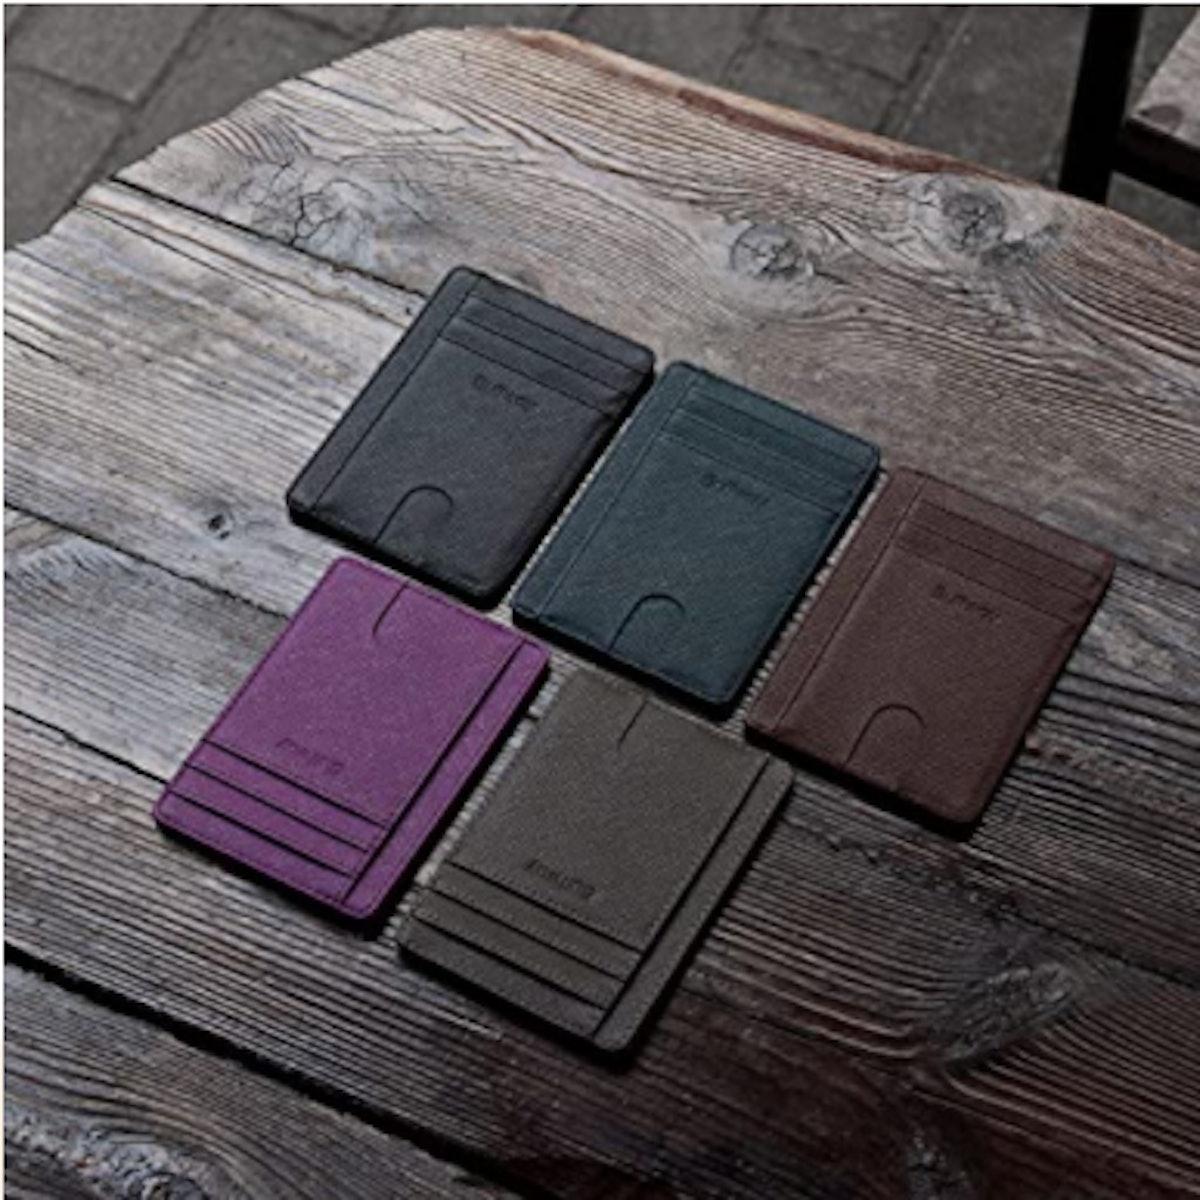 Buffway Slim Minimalist RFID Blocking Wallet